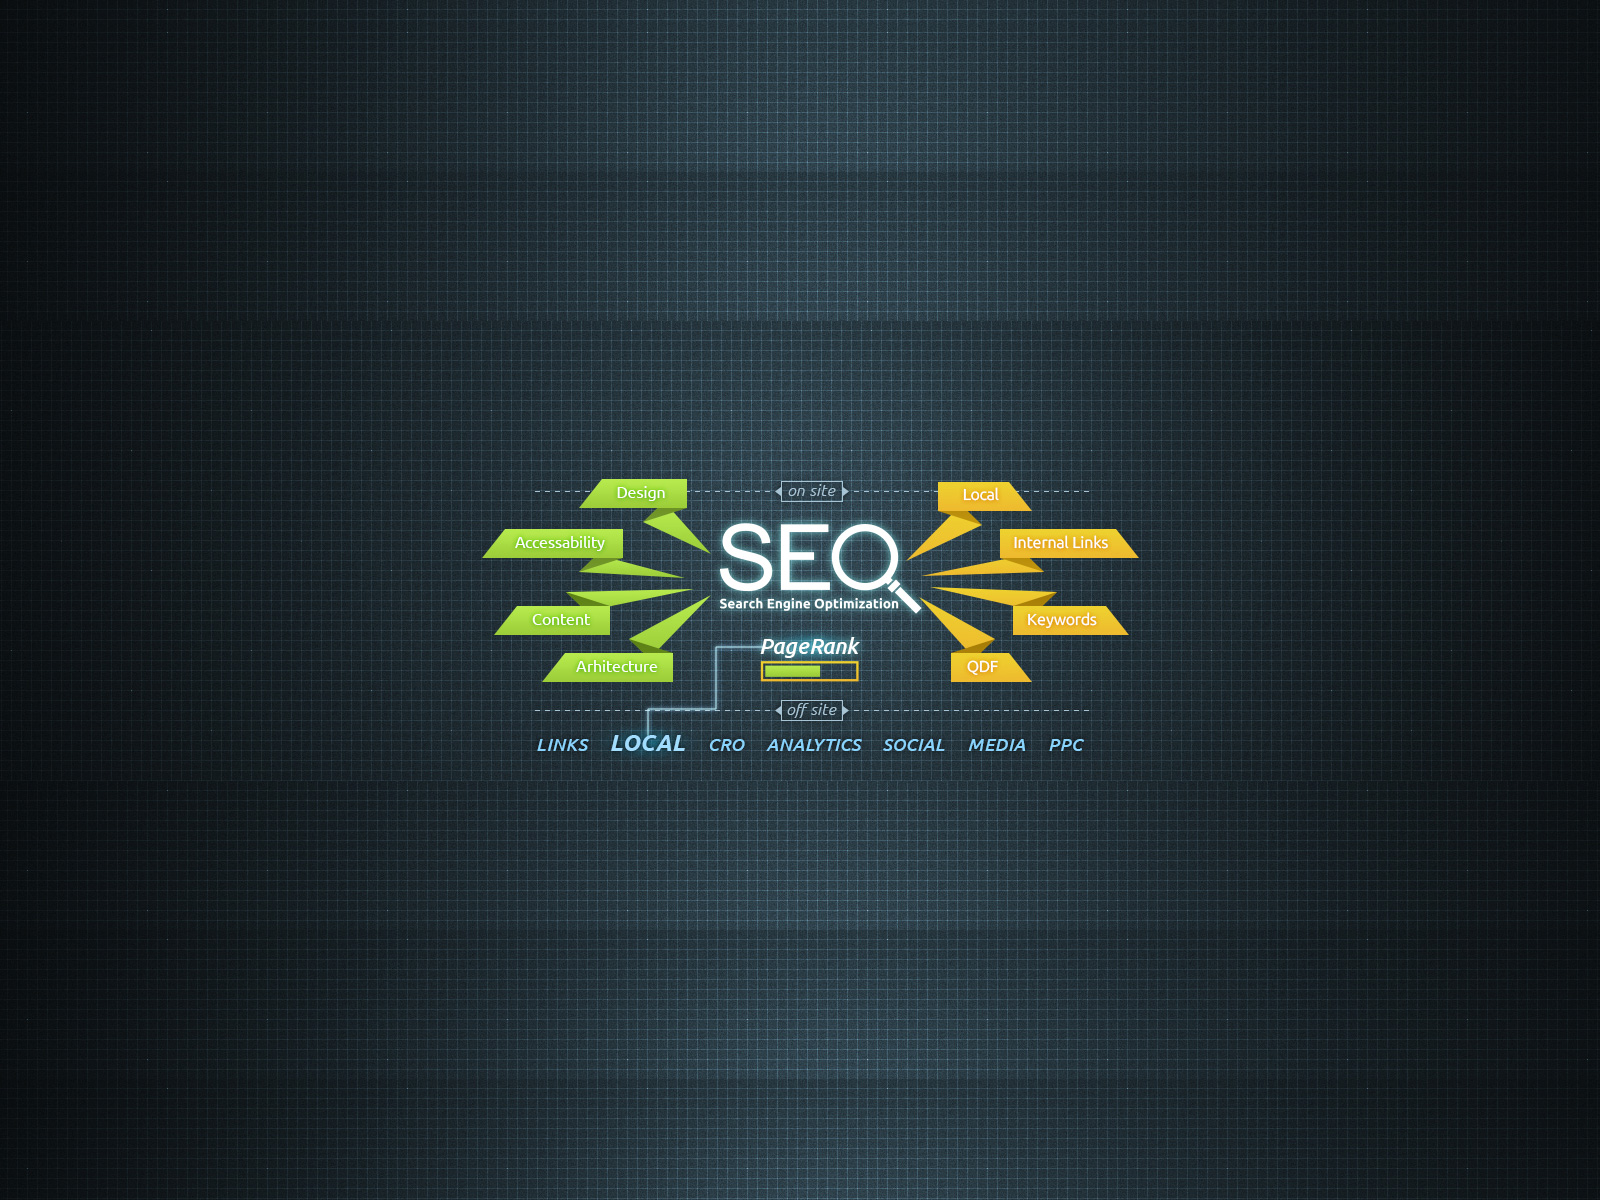 Web Design Company | Digital Marketing | SEO | SMM | PPC